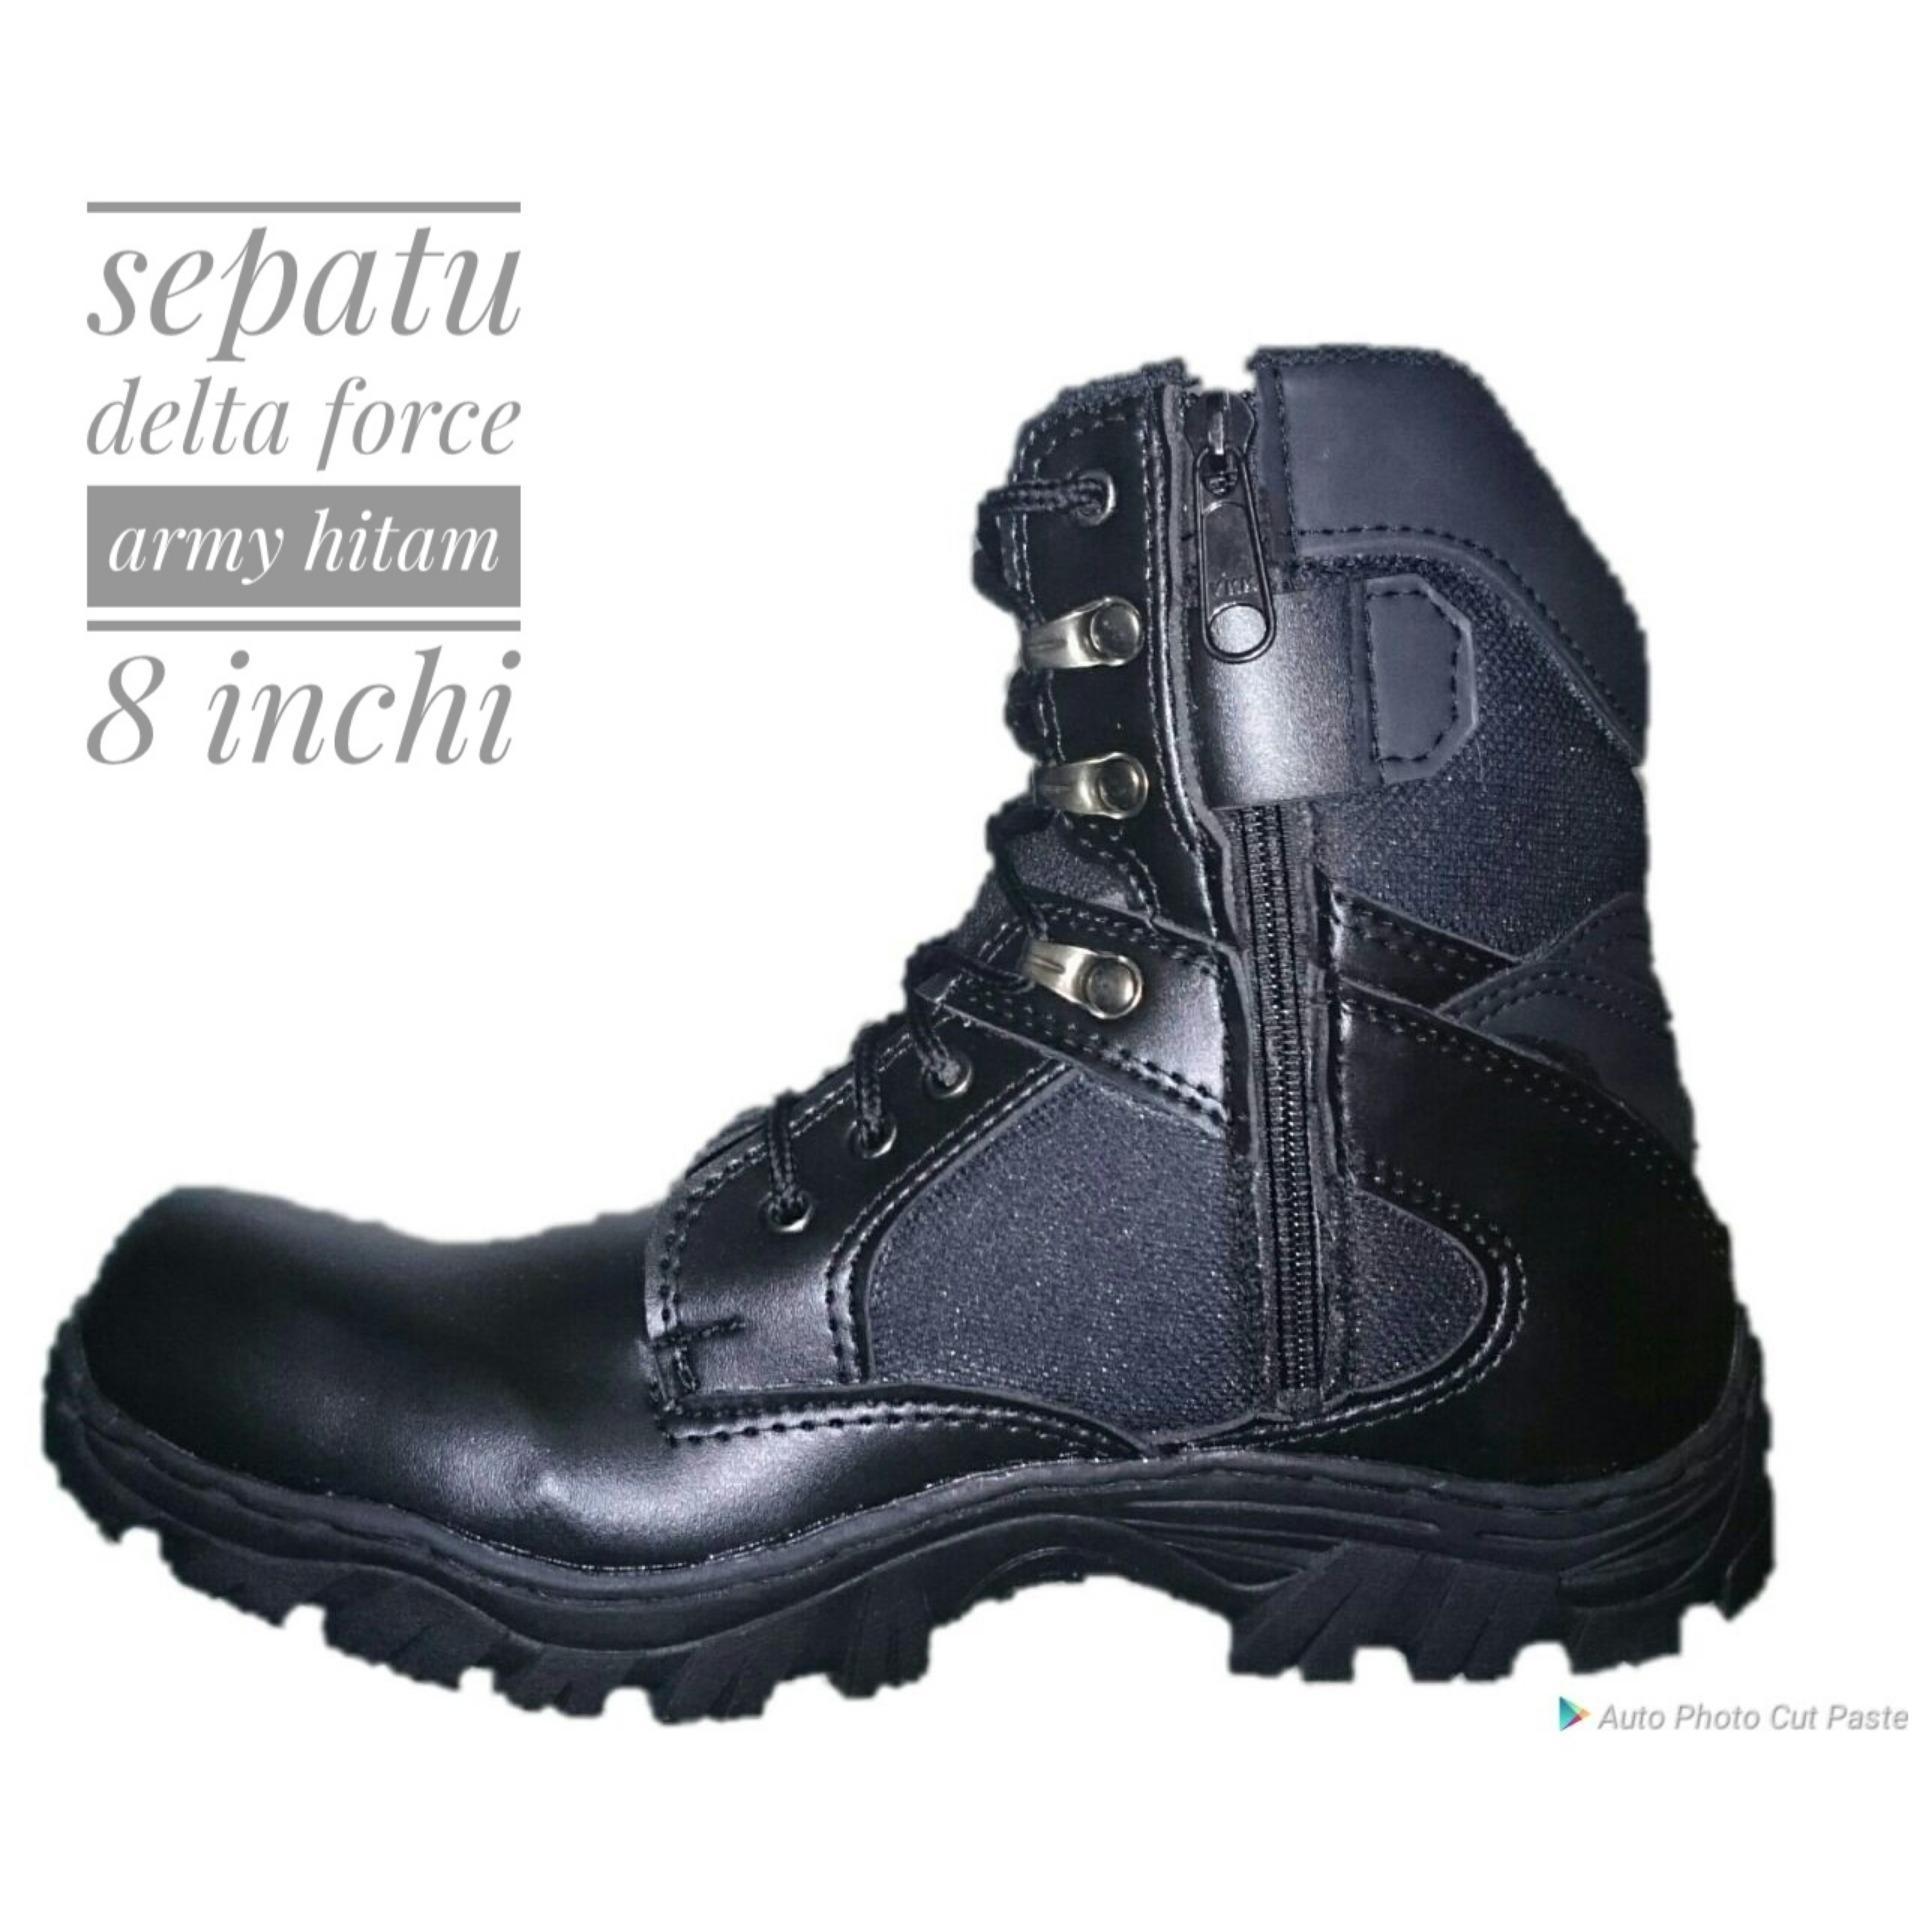 Sepatu Delta Hitam 8 inchi ad31a7a02d